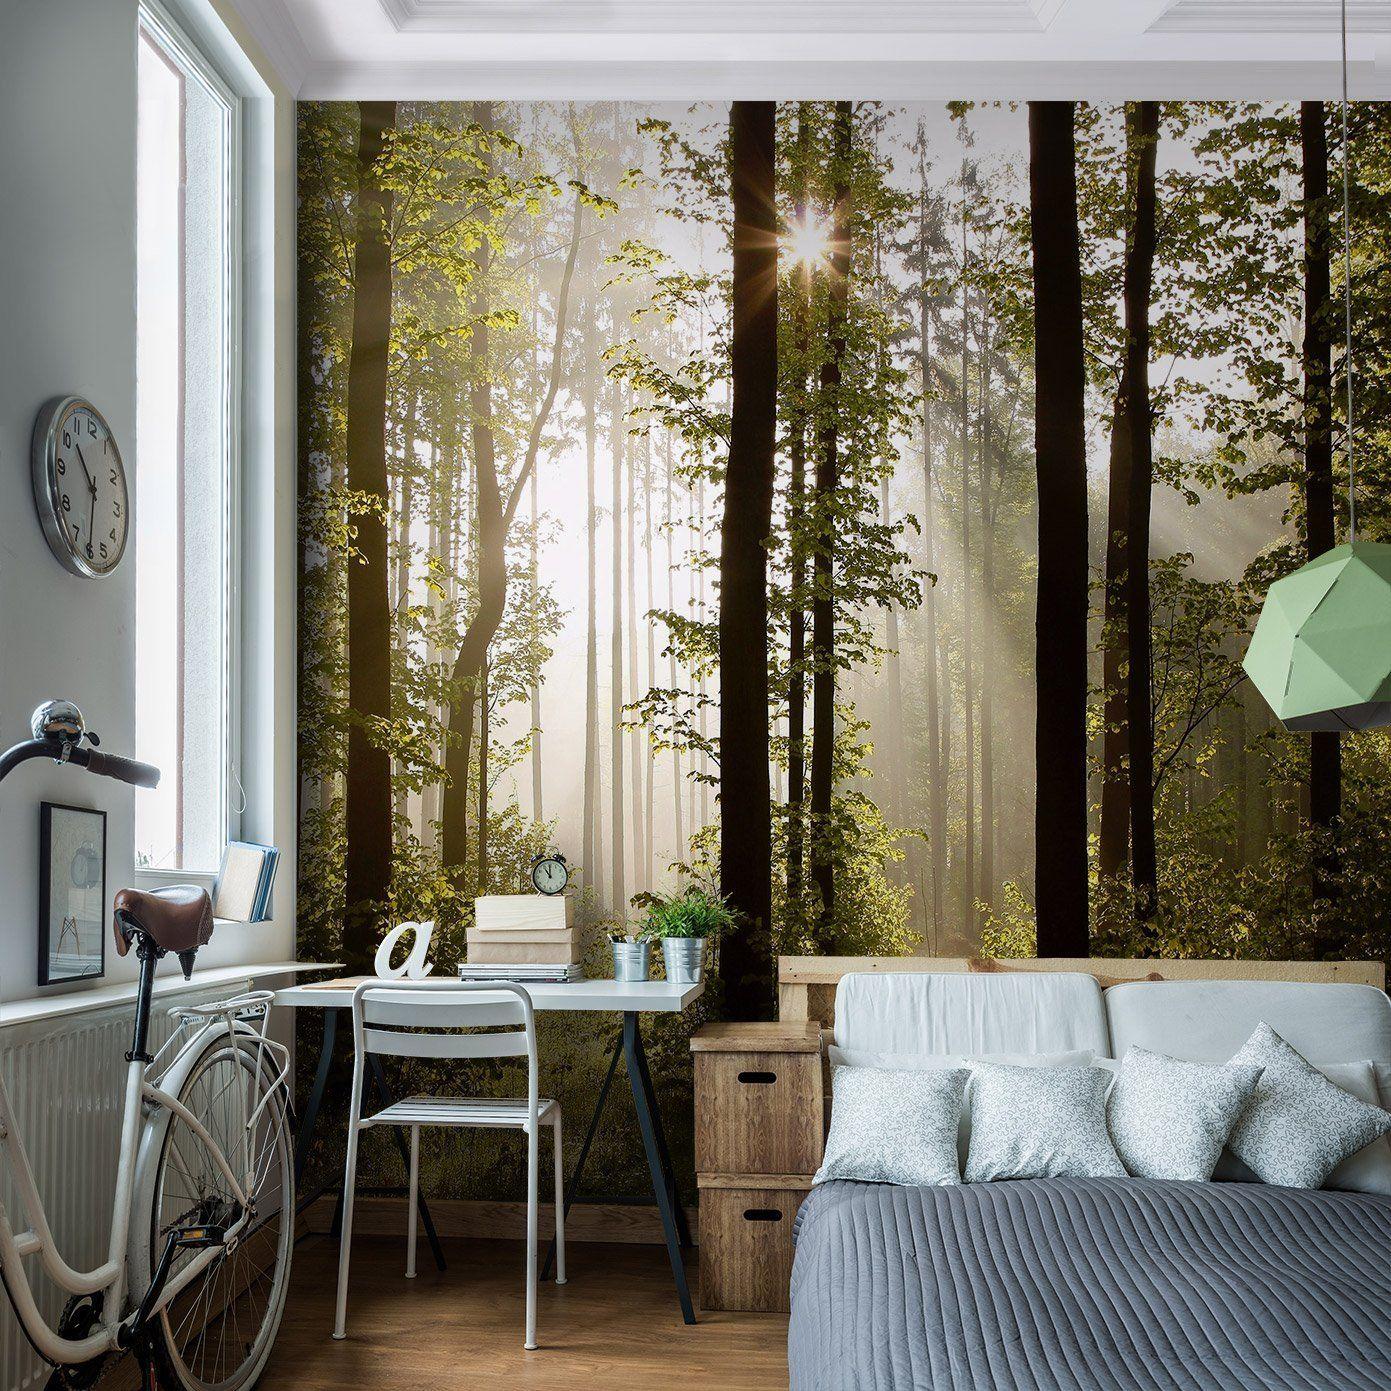 Www Amazon De Gp Aw D B01c60sde6 Psc X3d 1 Schone Schlafzimmer